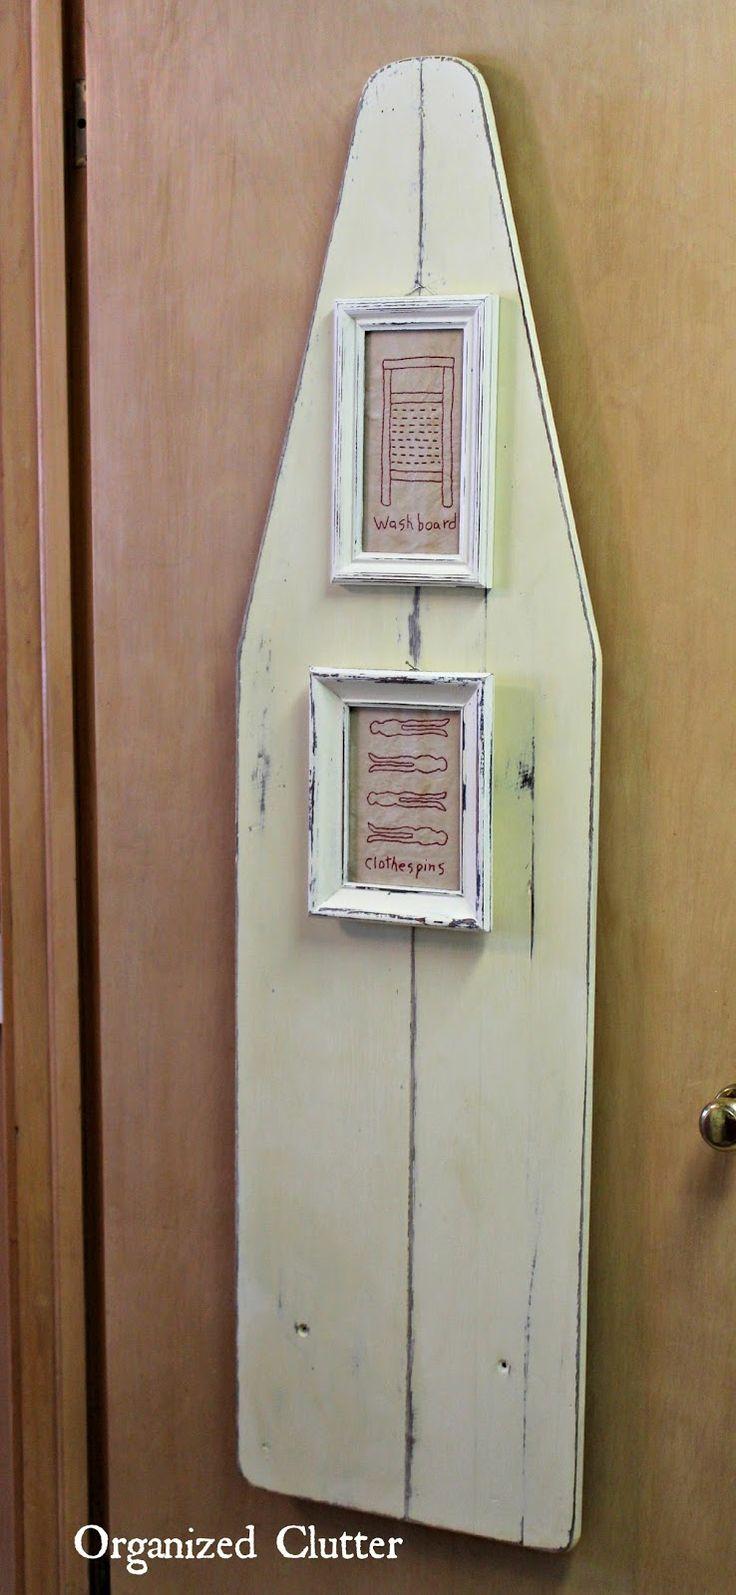 Laundry Room Door Decor - Painted Ironing Board www.organizedclutterqueen.blogspot.com